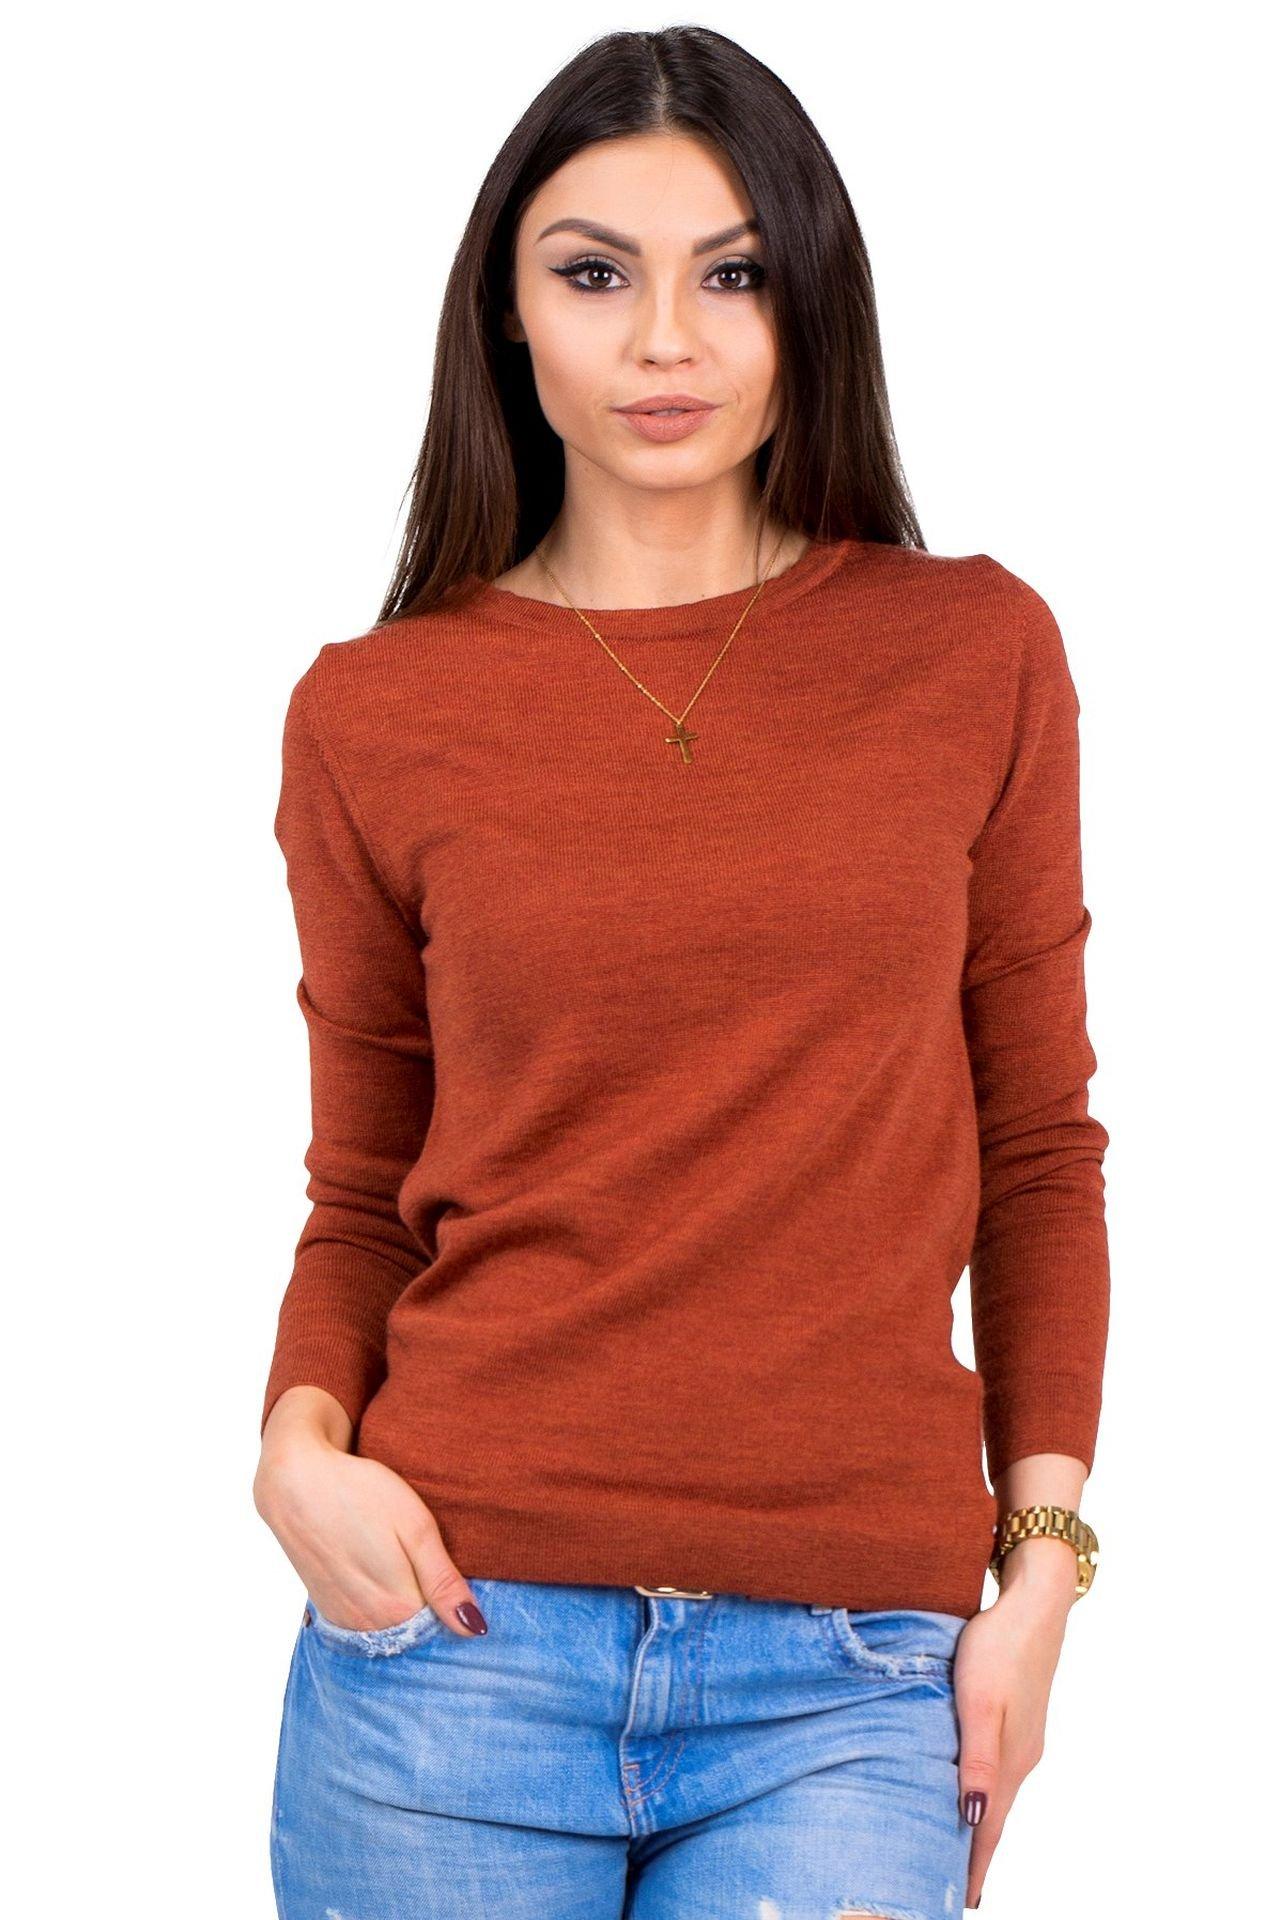 Women's Pure Merino Wool Classic Knit Top Lightweight Crew Neck Sweater Long Sleeve Pullover (X-Large, Orange)